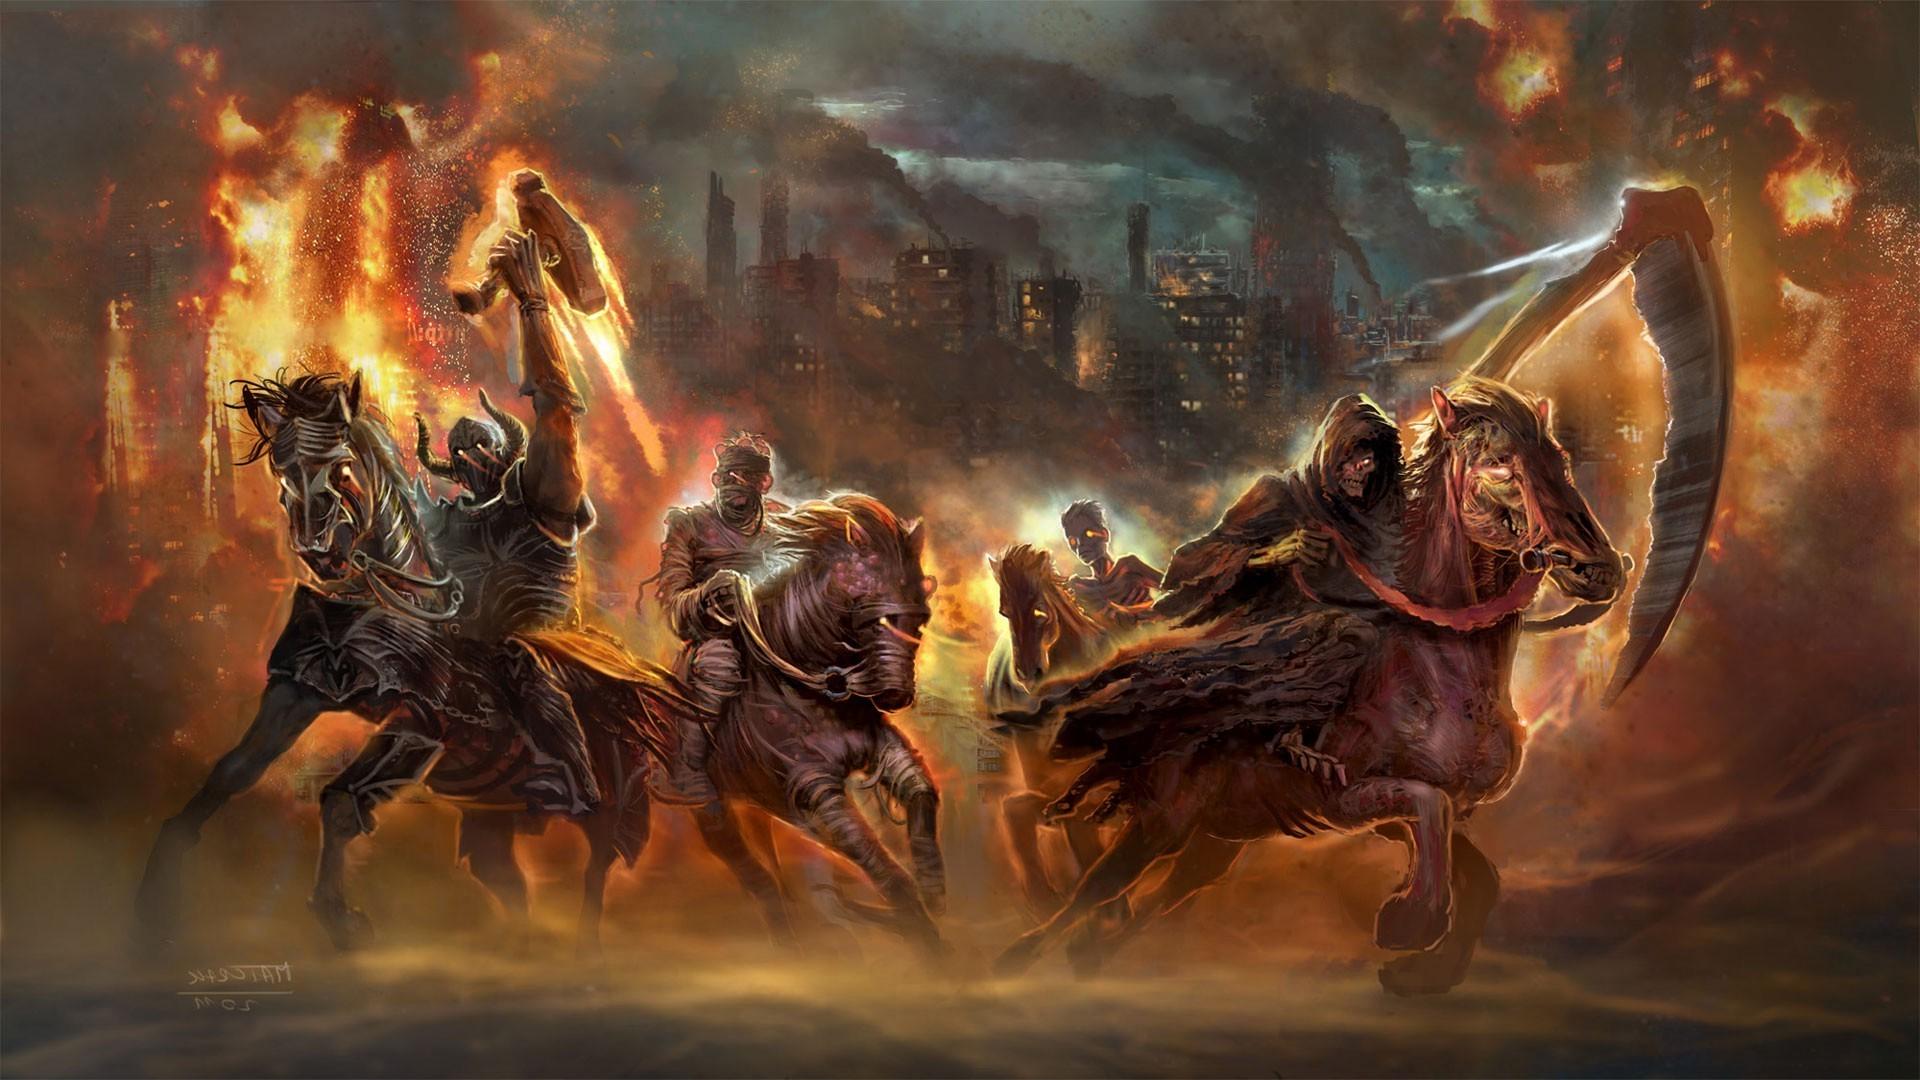 Wallpaper : 1920x1080 px, apocalyptic, destruction, fantasy